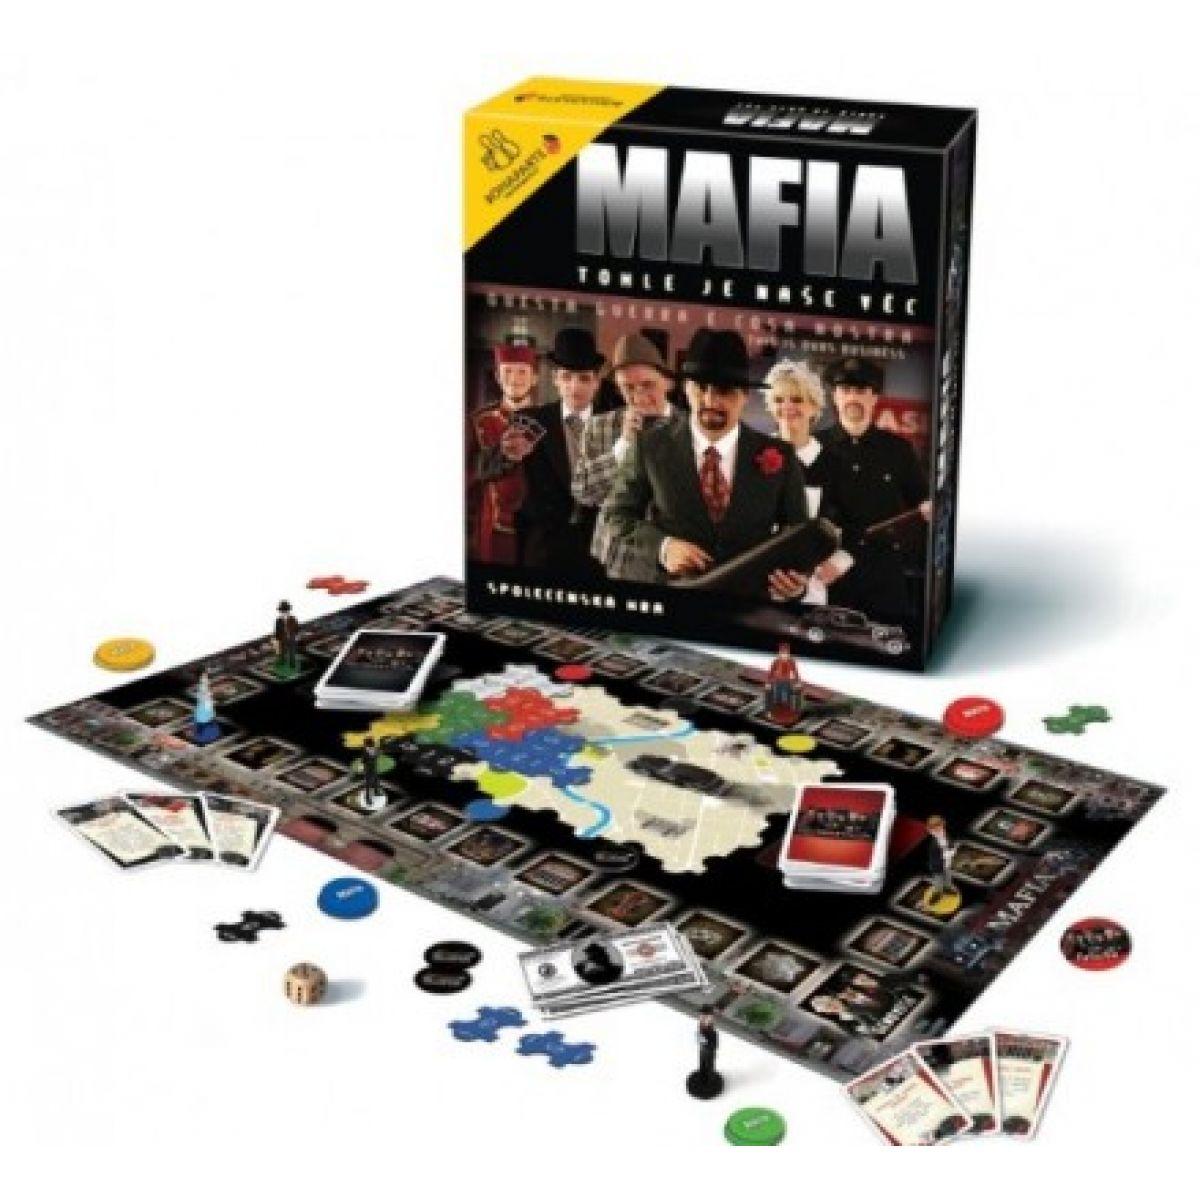 BONAPARTE 00766 - Společenská hra - Mafia